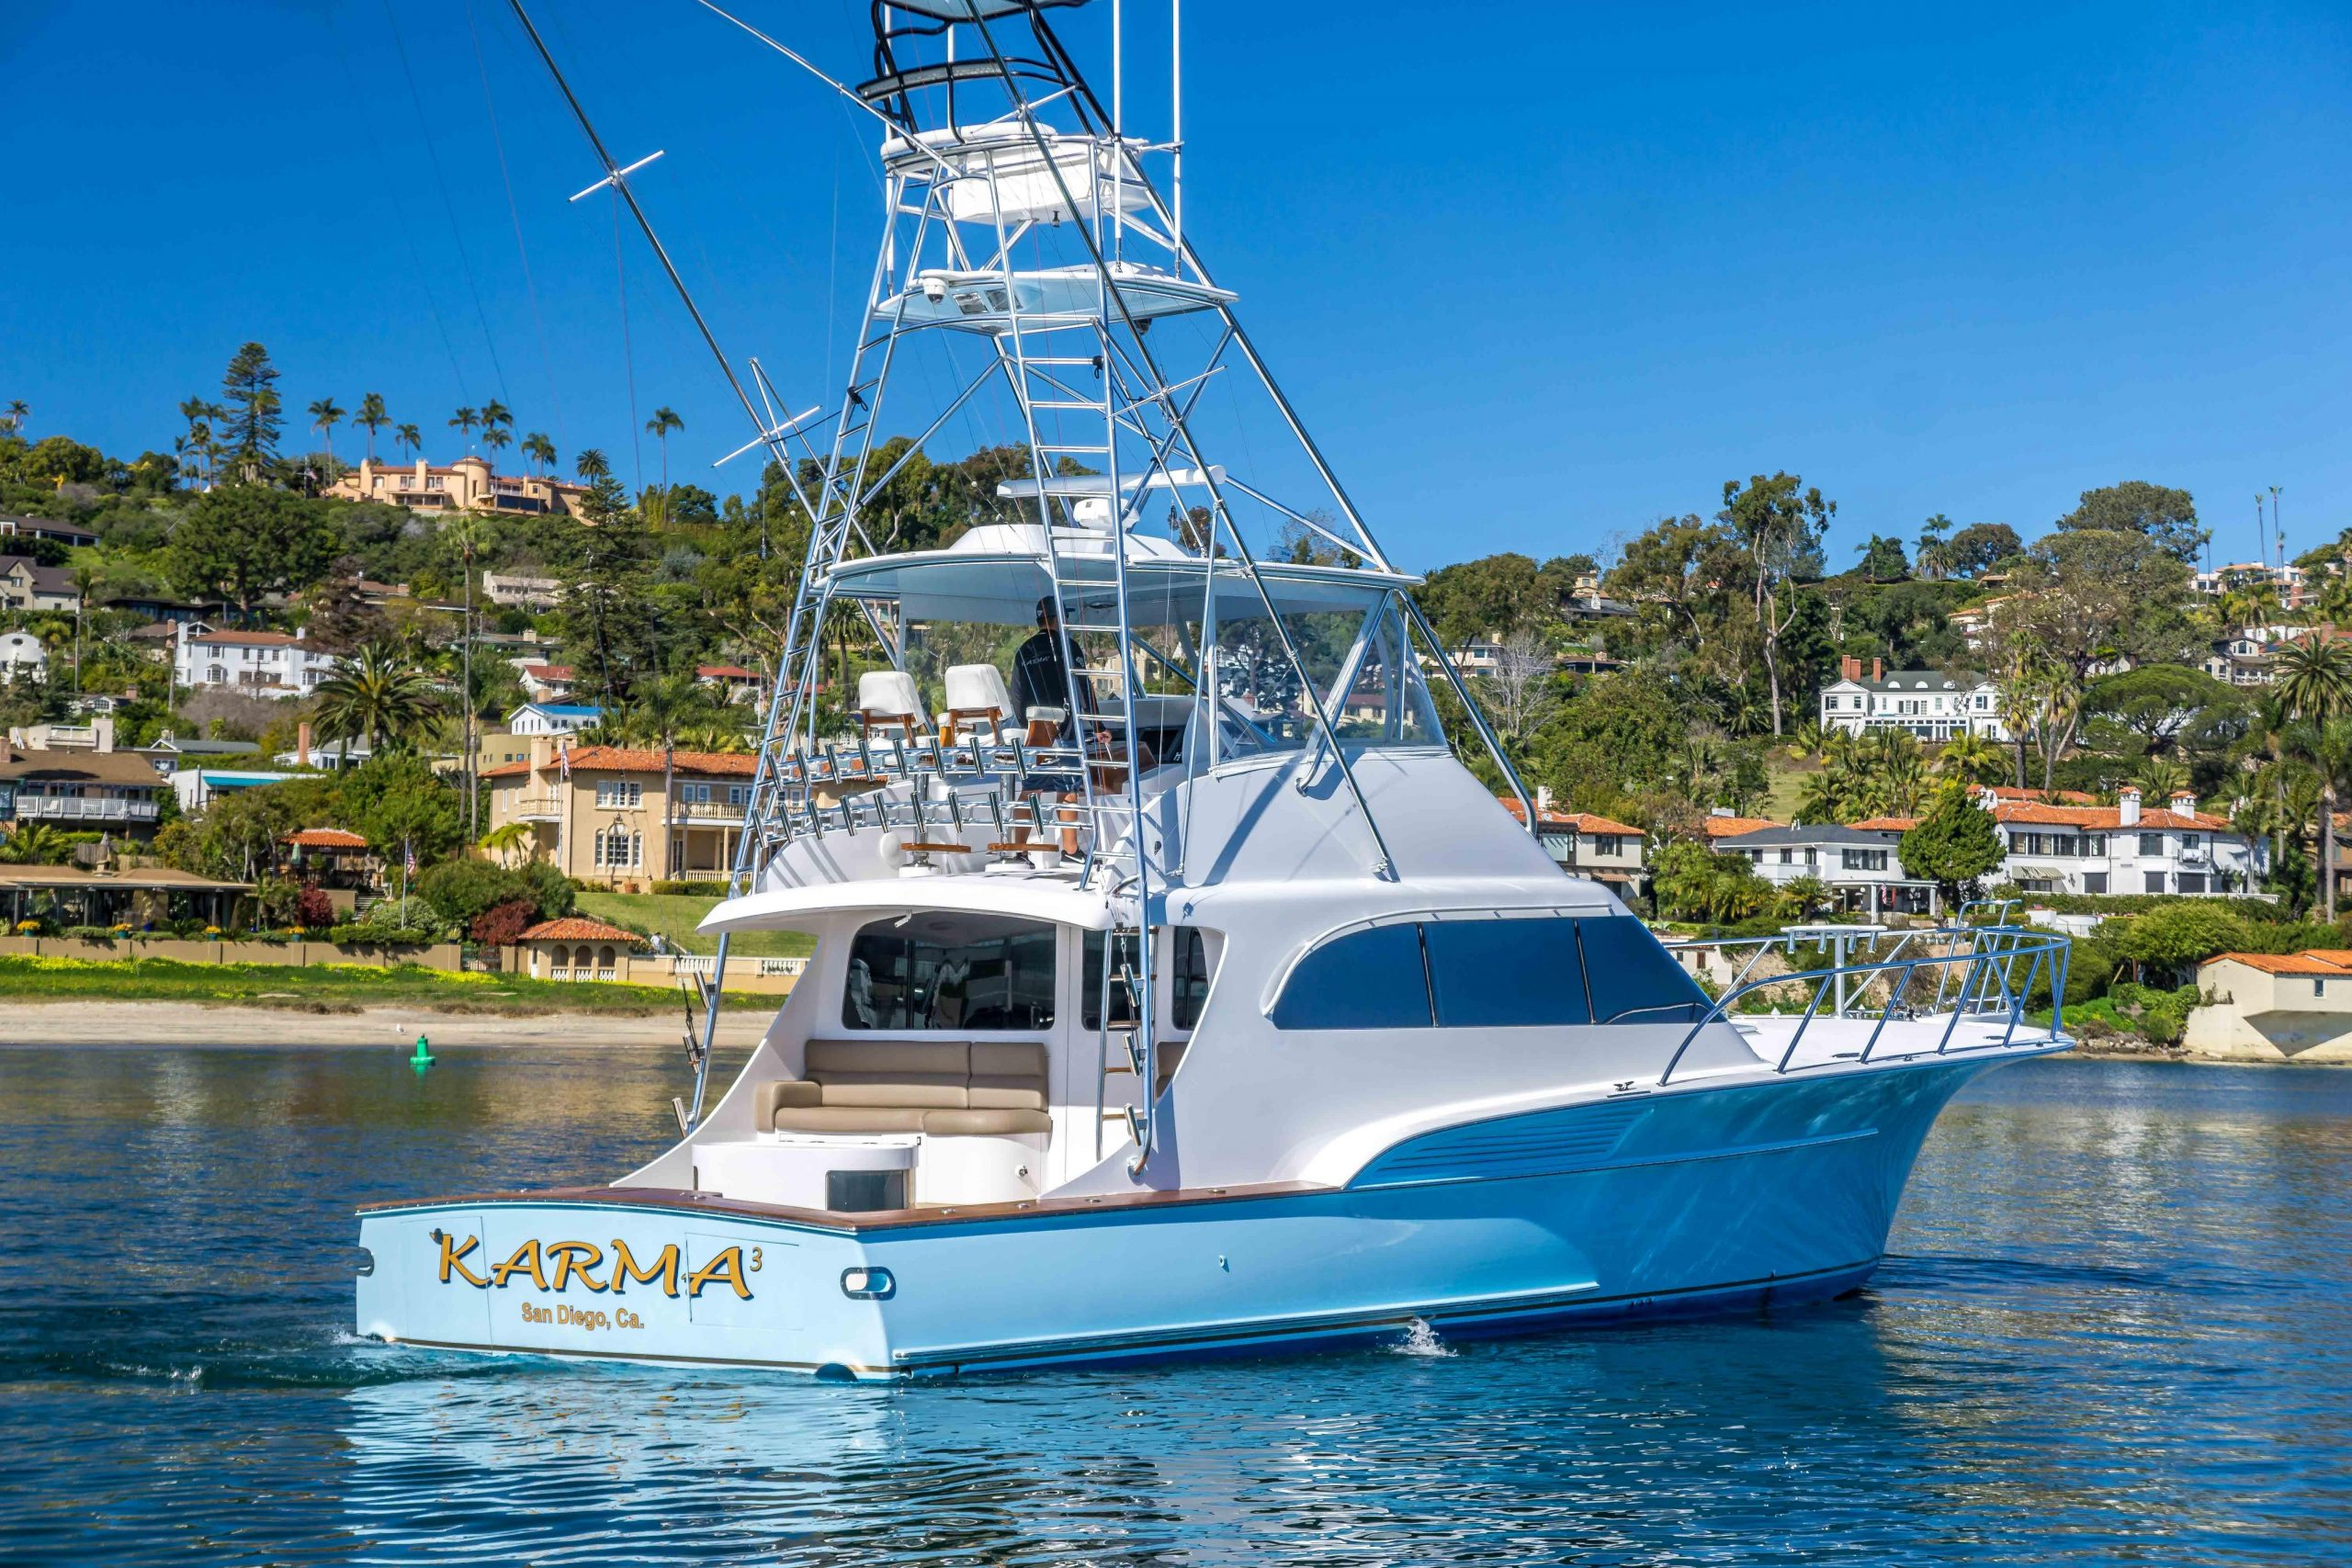 KARMA is a Sculley Custom Carolina Sportfisher Yacht For Sale in San Diego-0